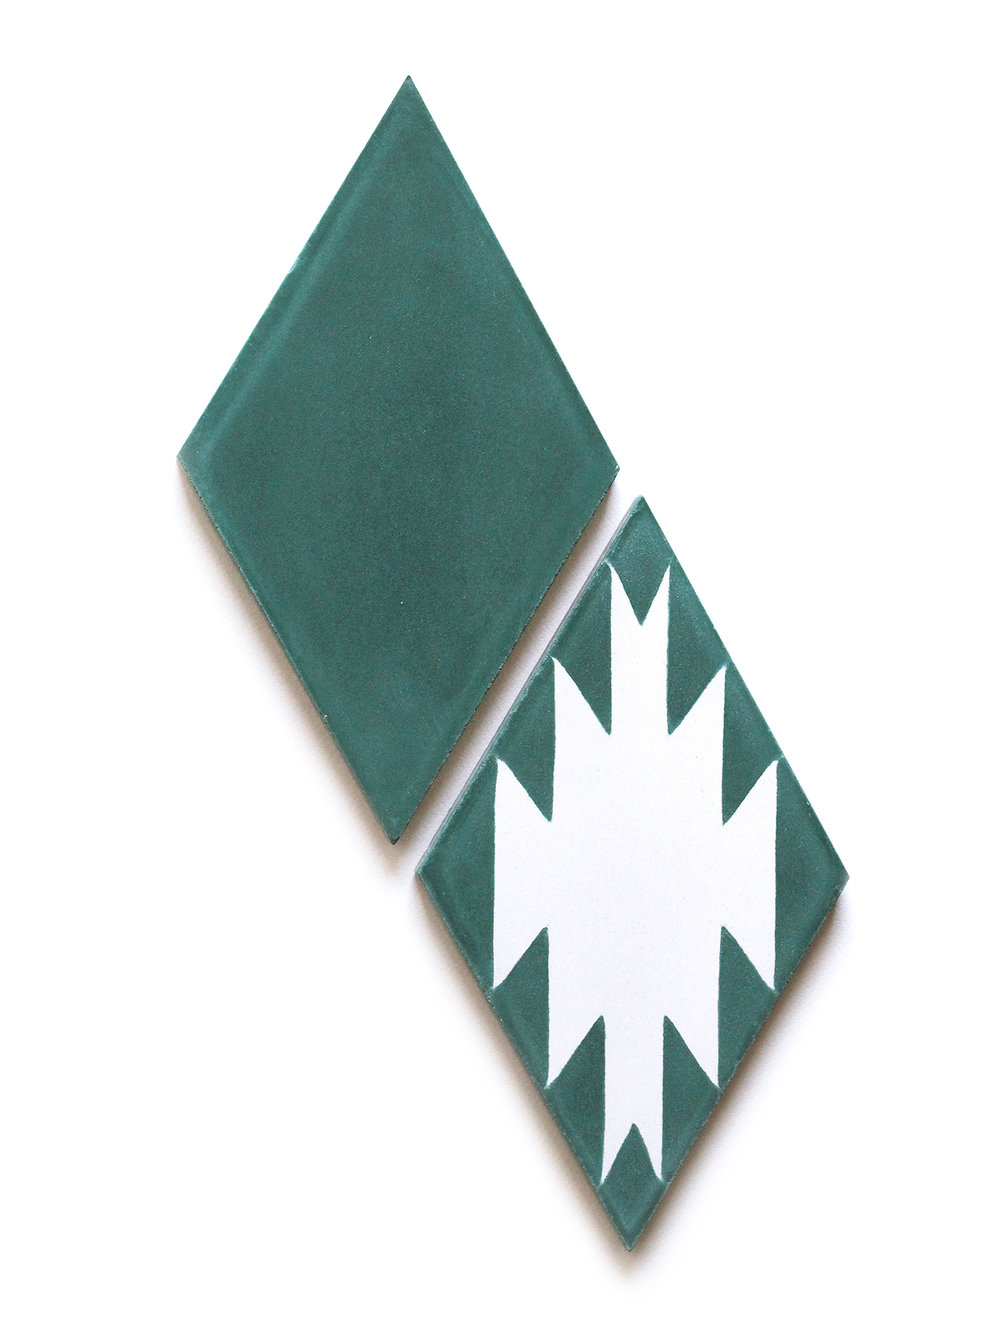 PLAIN DIAMOND | R70/tile PATTERN DIAMOND;TOUBKAL |R75/tile (AVAILABLE TO ORDER)